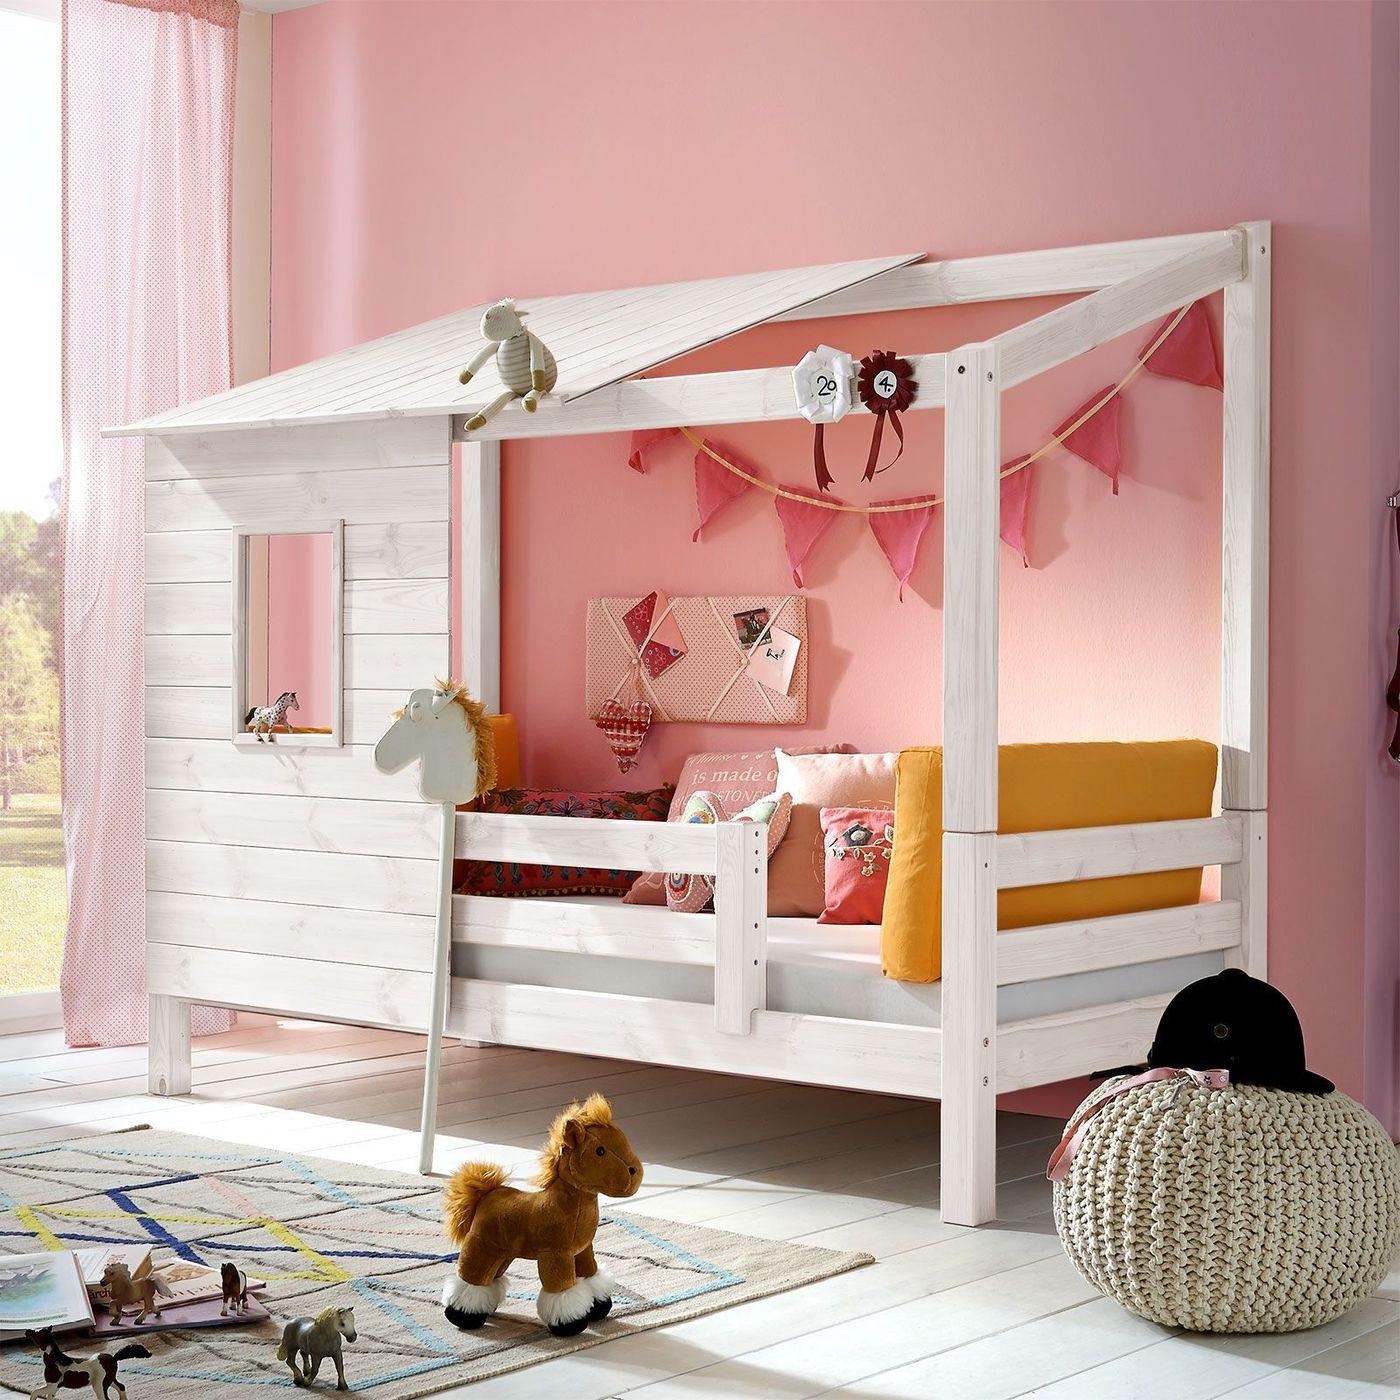 Full Size of Mädchenbetten Abenteuerbett Aus Massivholz Fr Mdchen Kids Paradise Wohnzimmer Mädchenbetten